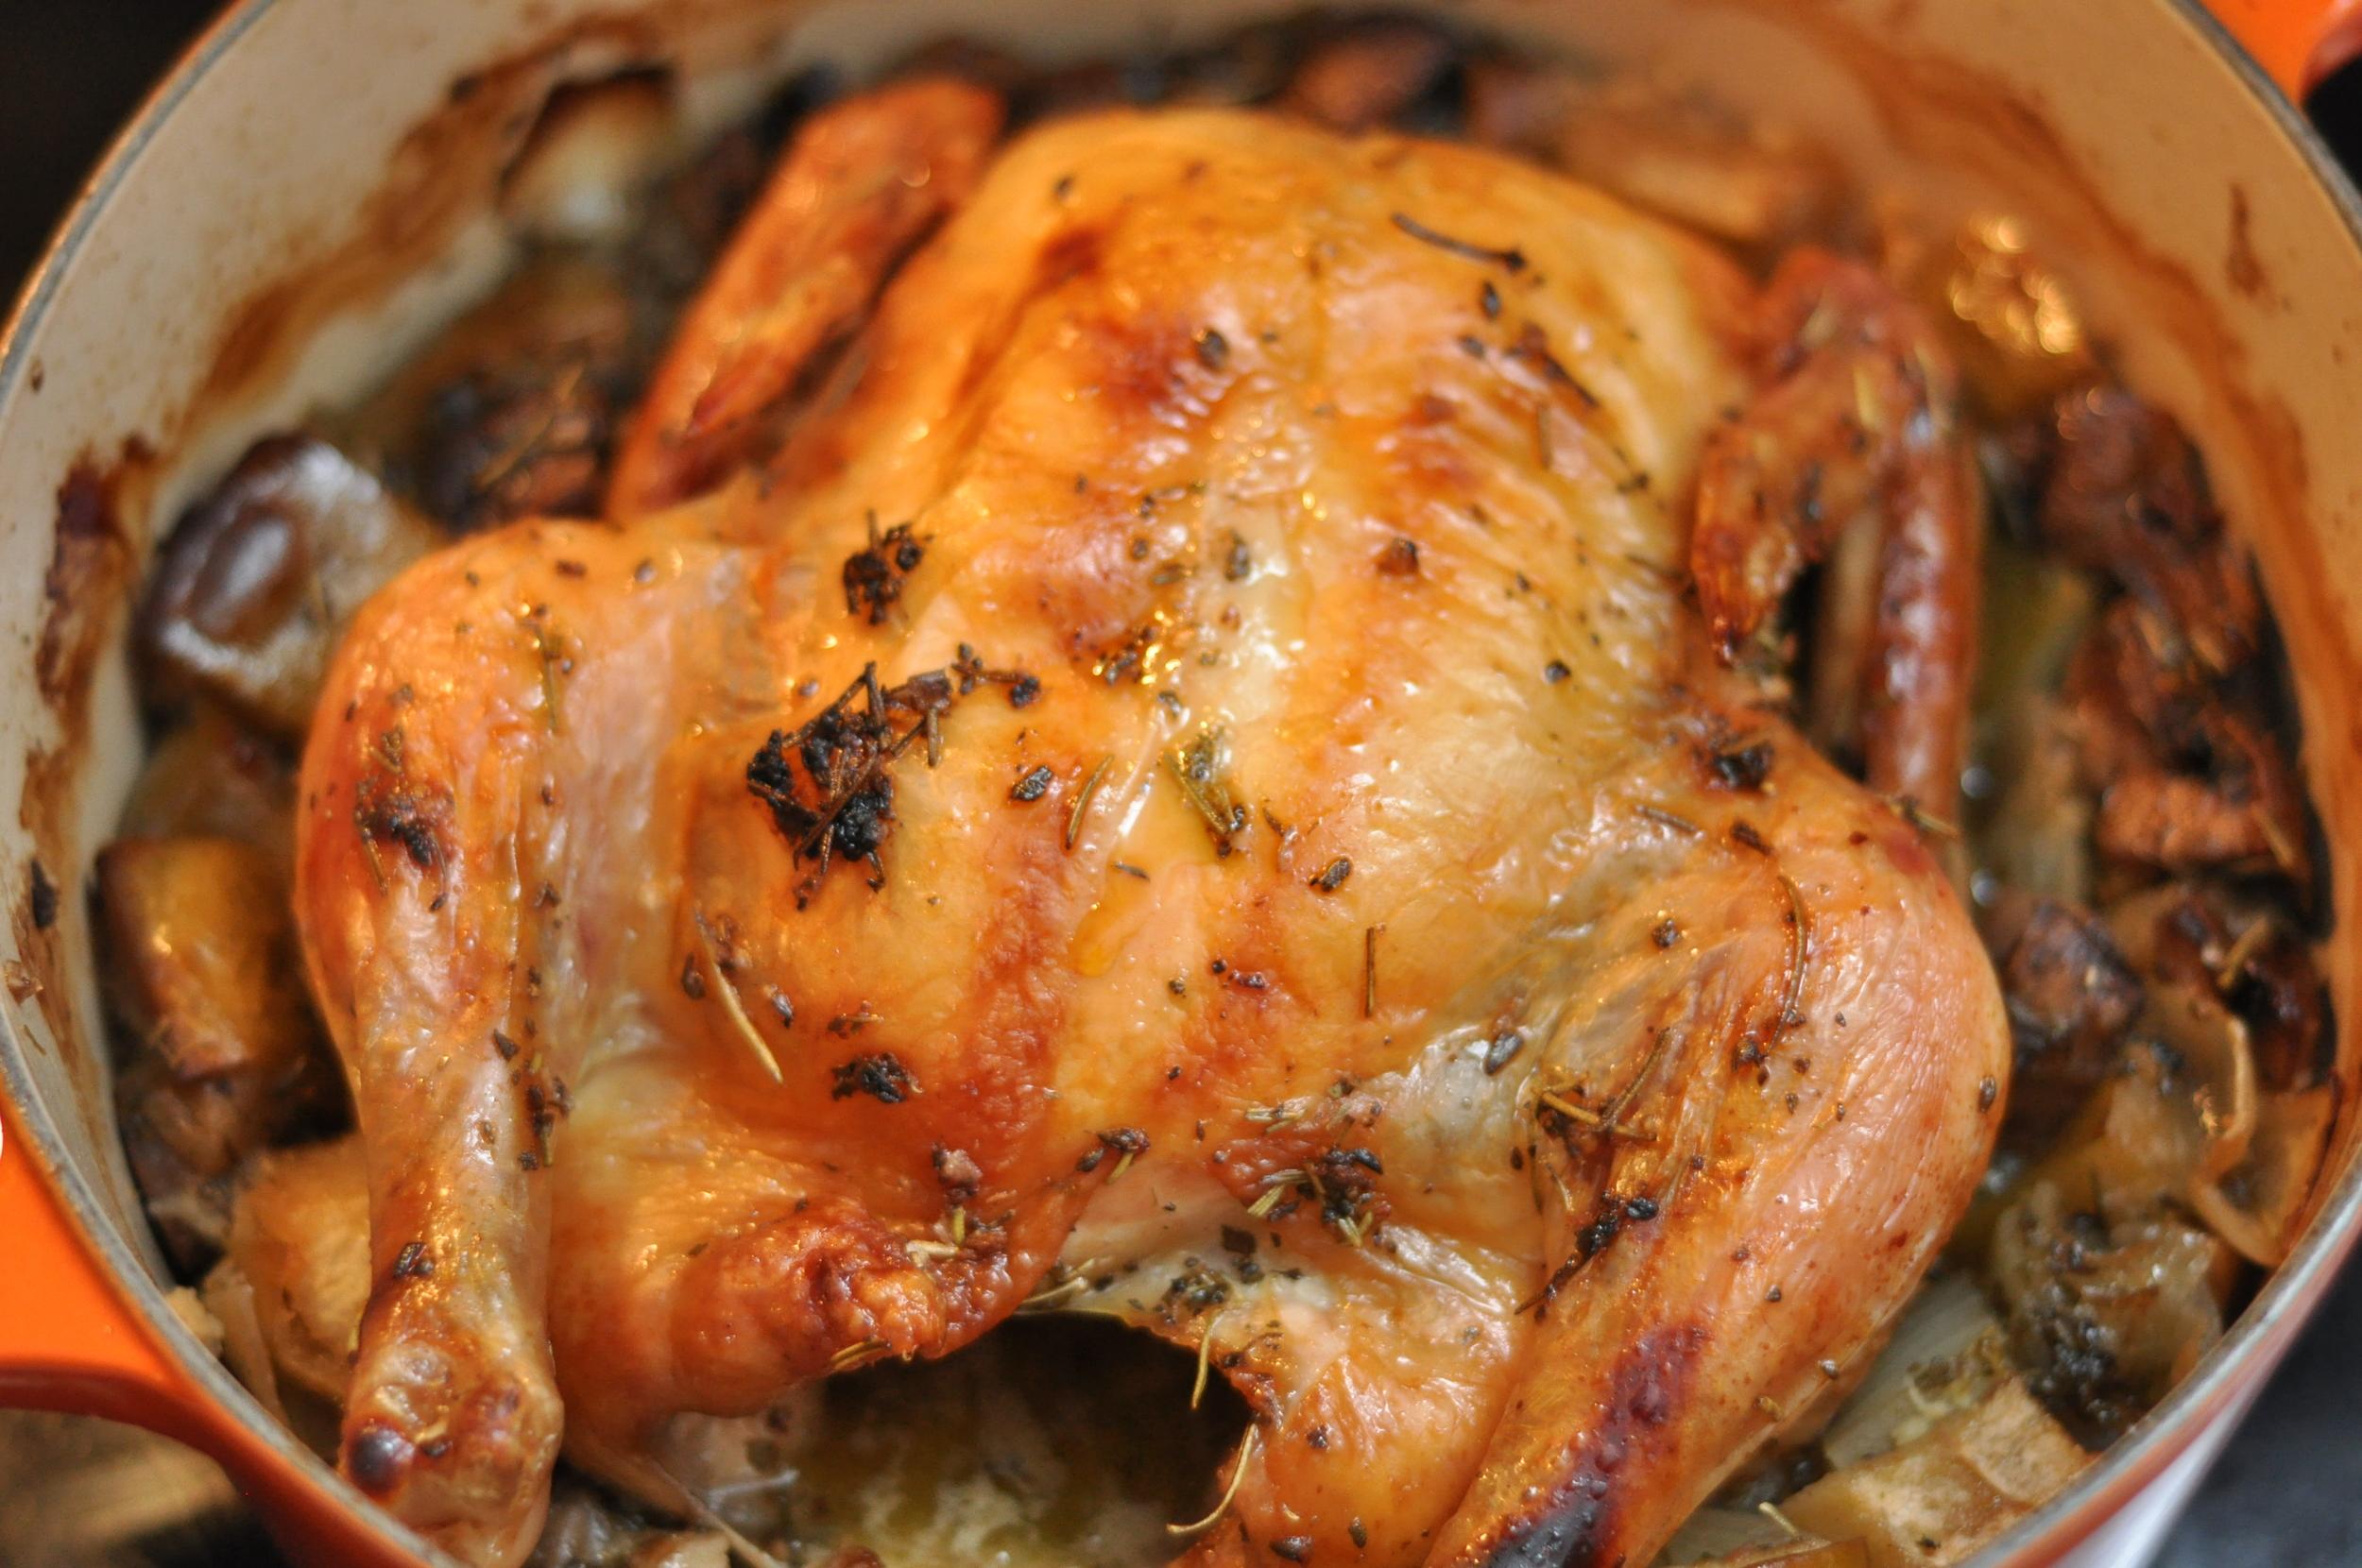 Roast Chicken with Apples, Onions, Mushrooms - saltandtwine.wordpress.com